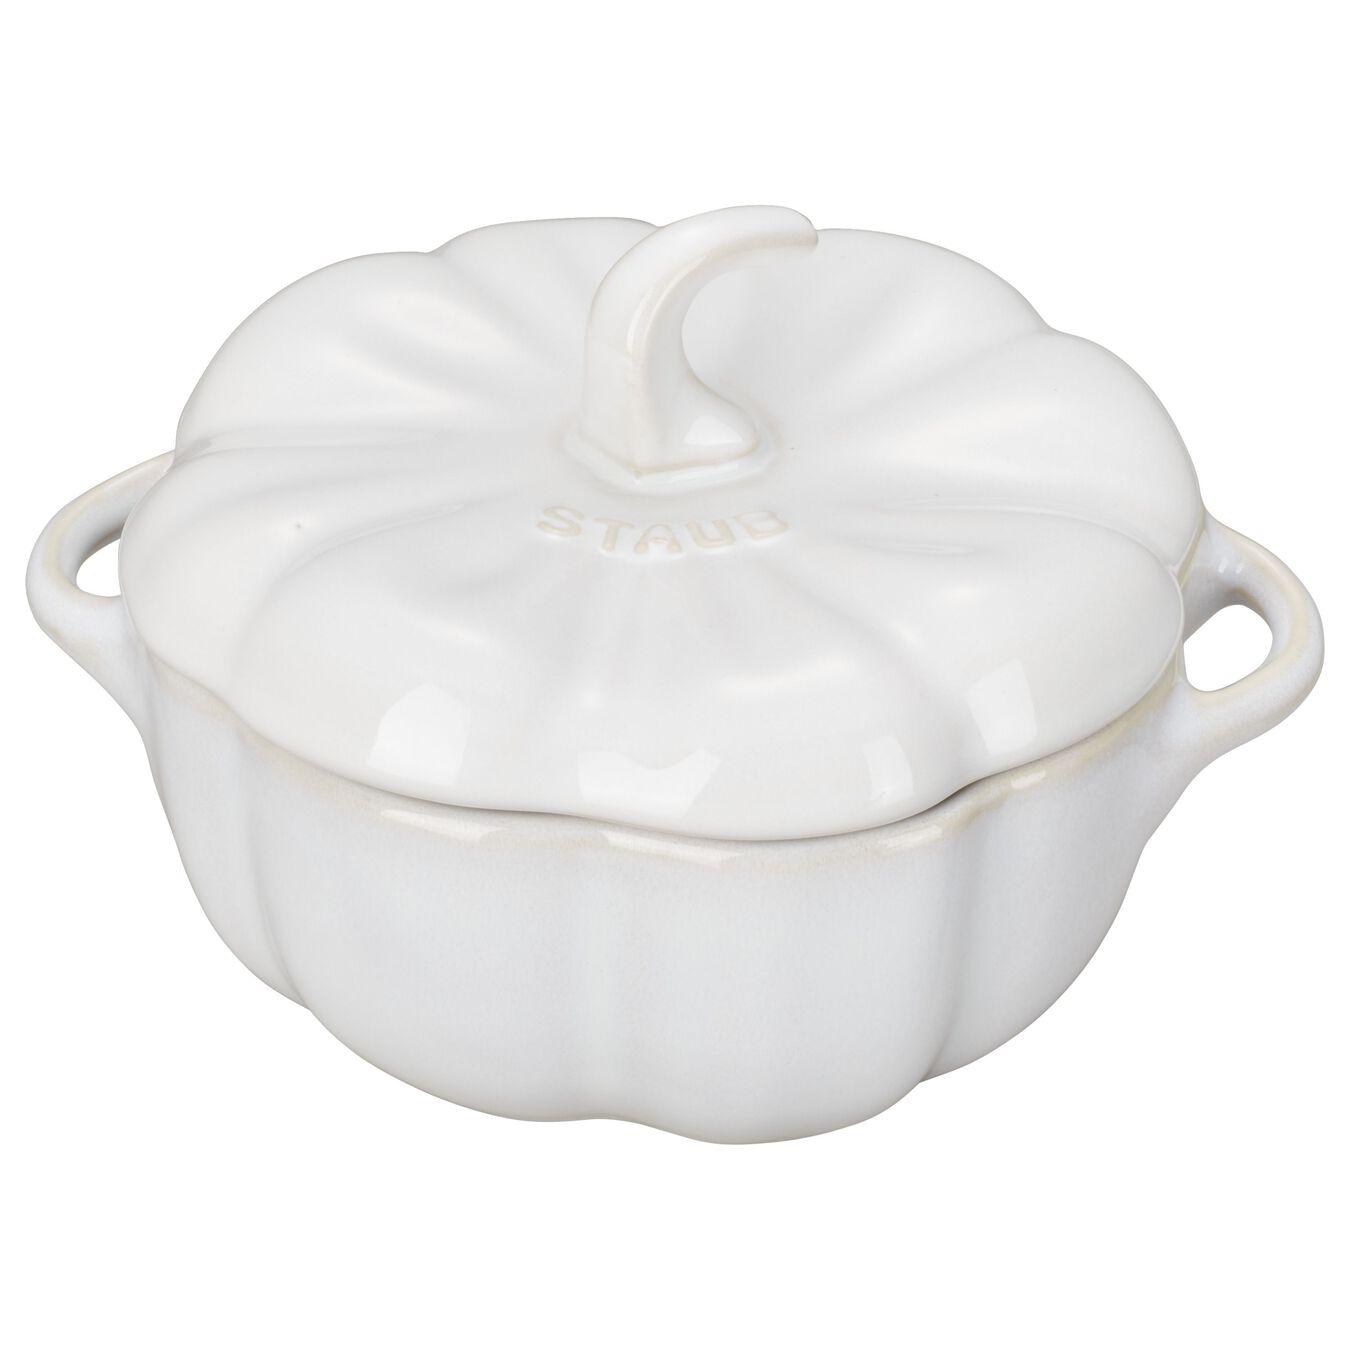 475 ml Ceramic pumpkin Cocotte, ivory-white,,large 1